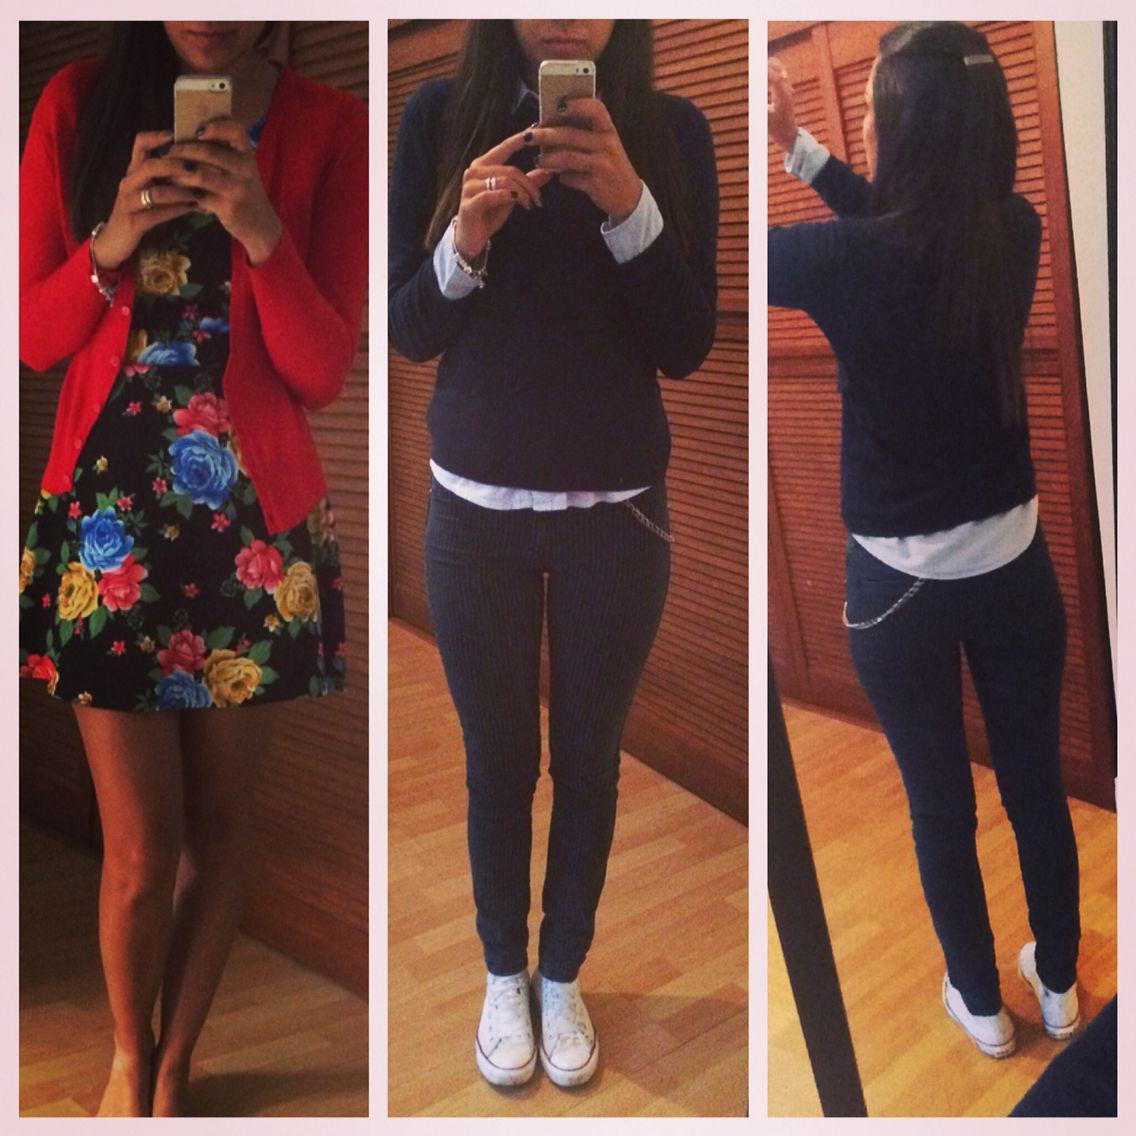 #outfit de la mañana #dress más #outfit para ir a la U #converse #fashion #mycloset  #mystyle #zin #U